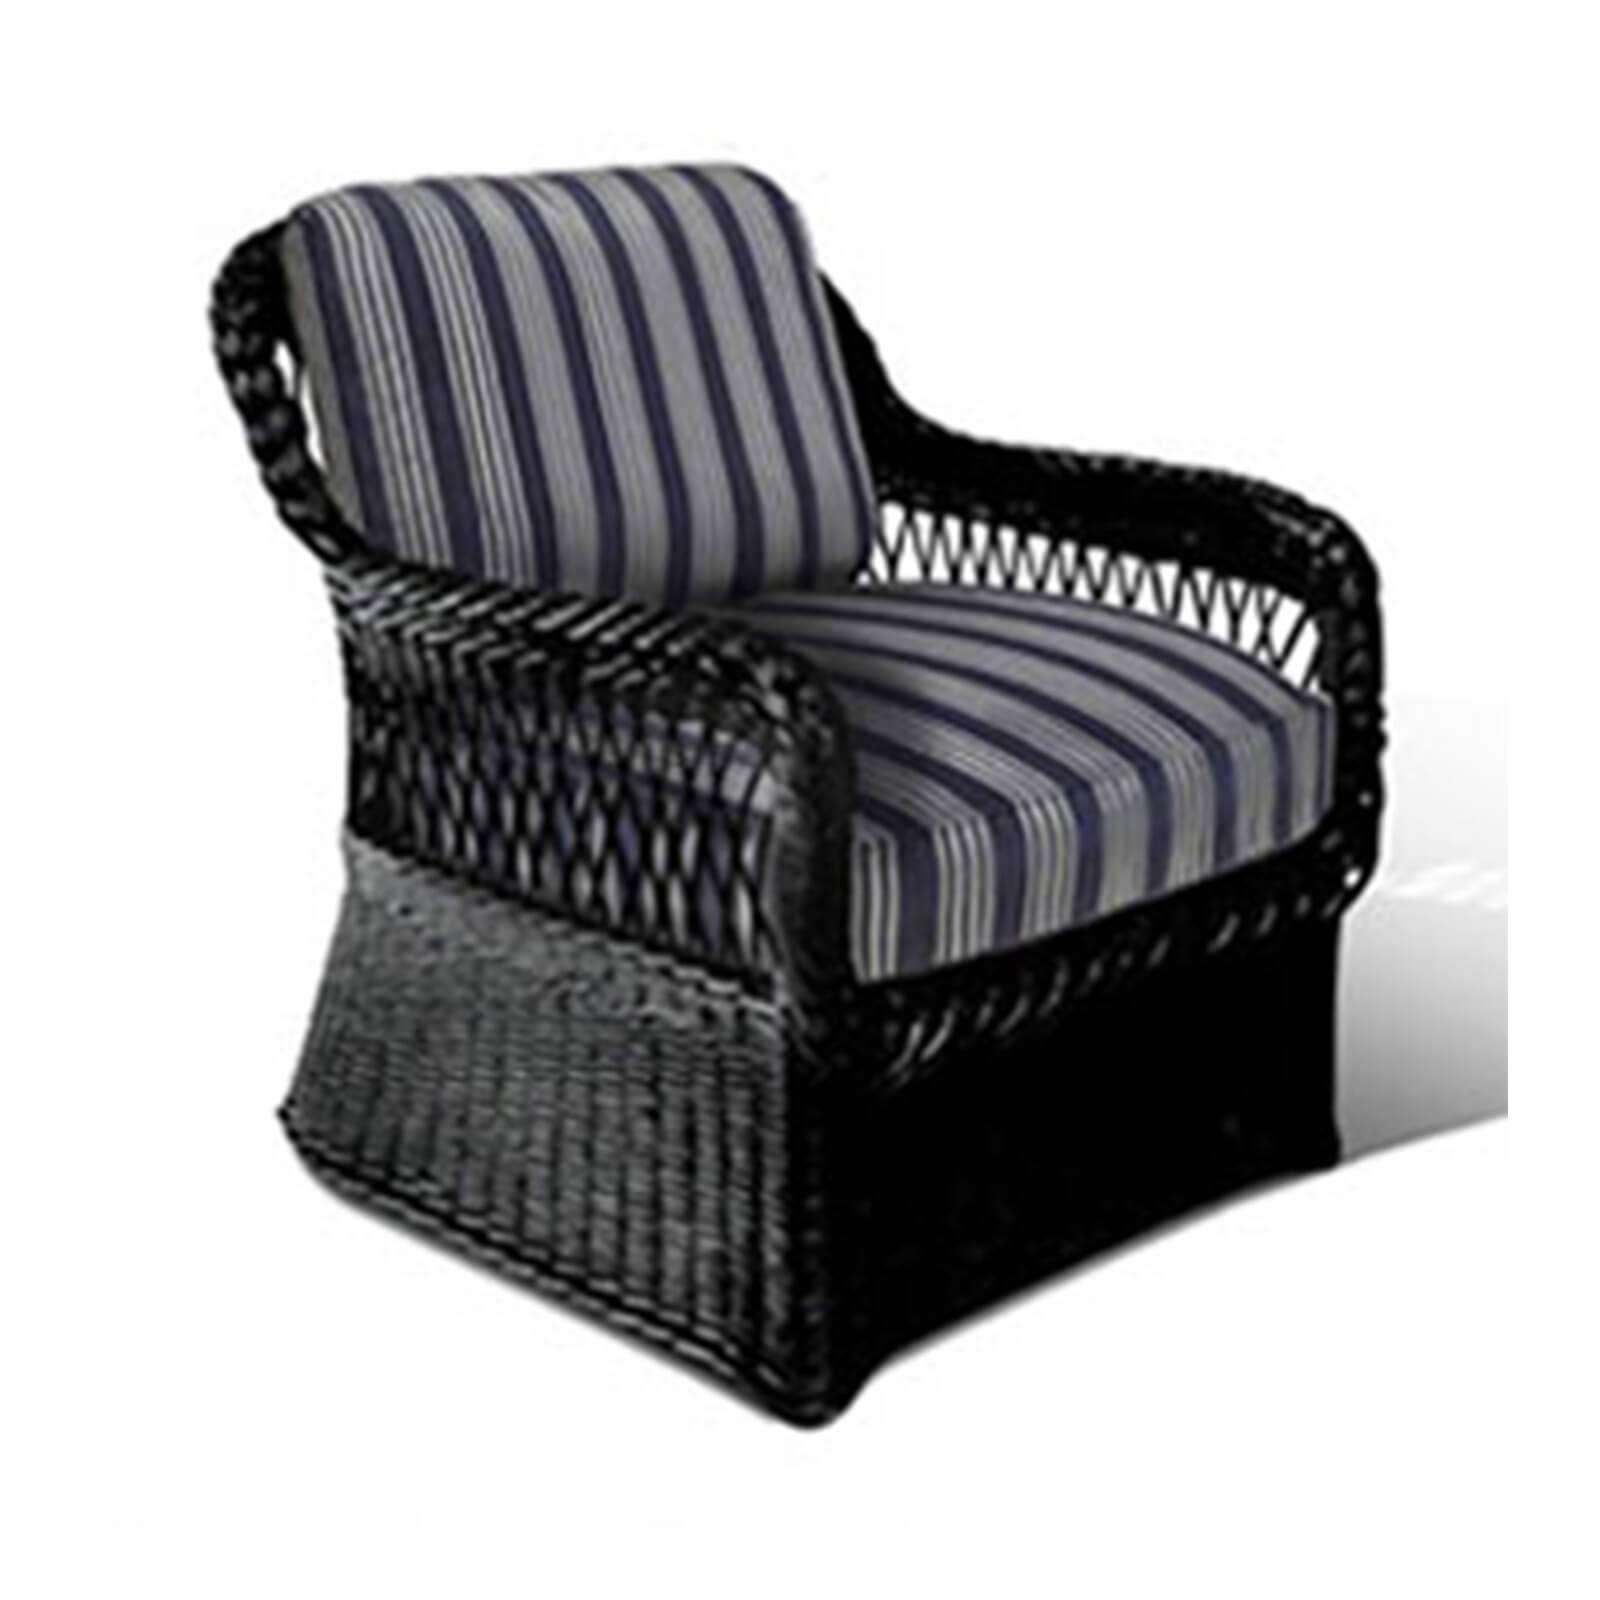 rattan furniture, rattan chair, colonial furniture